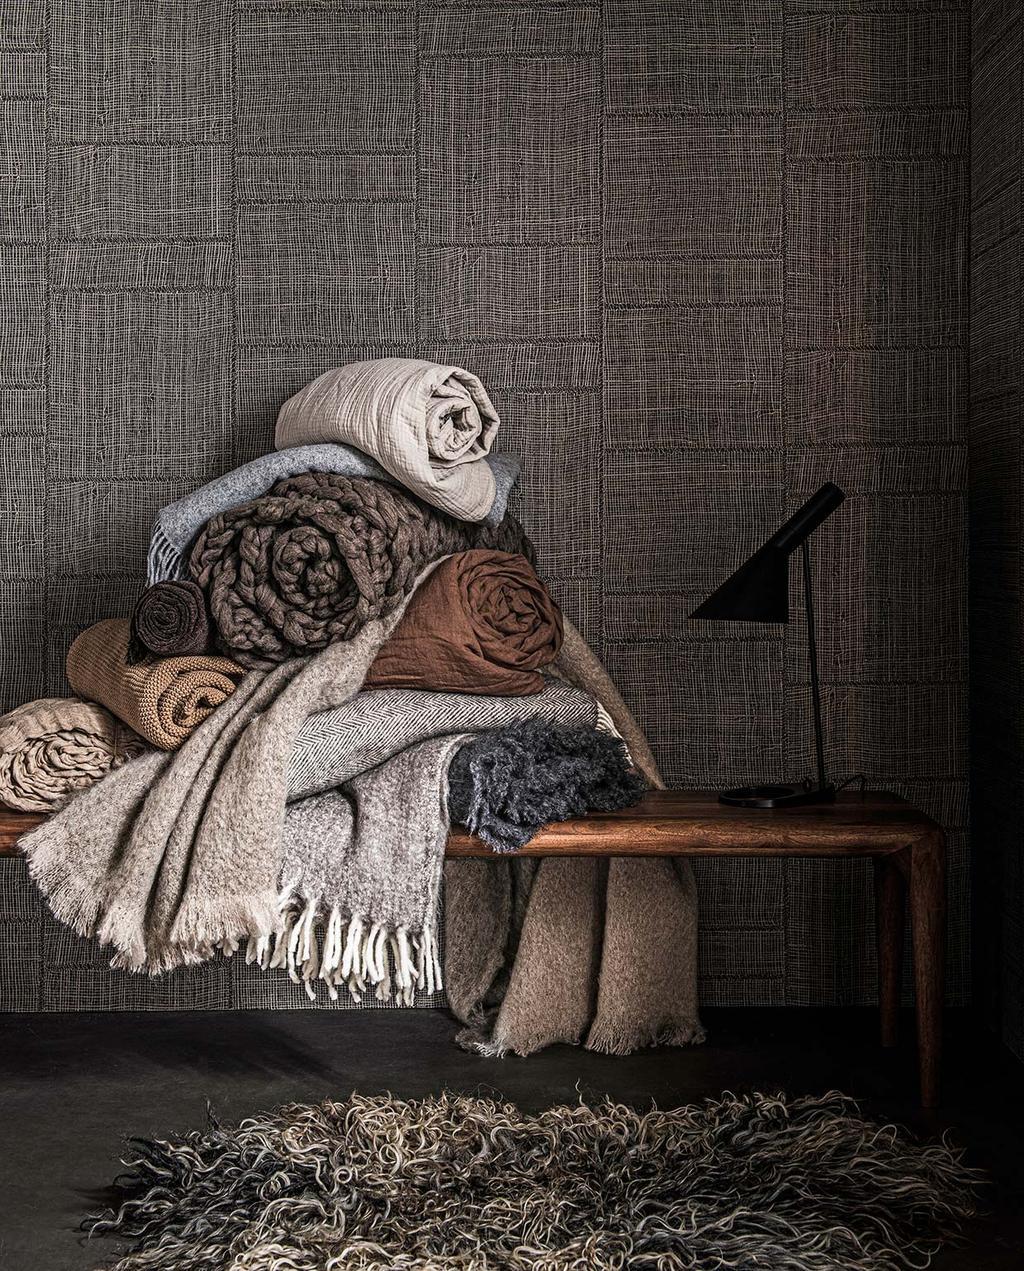 vtwonen 02-2021 | nachtleven dekens op houten bank